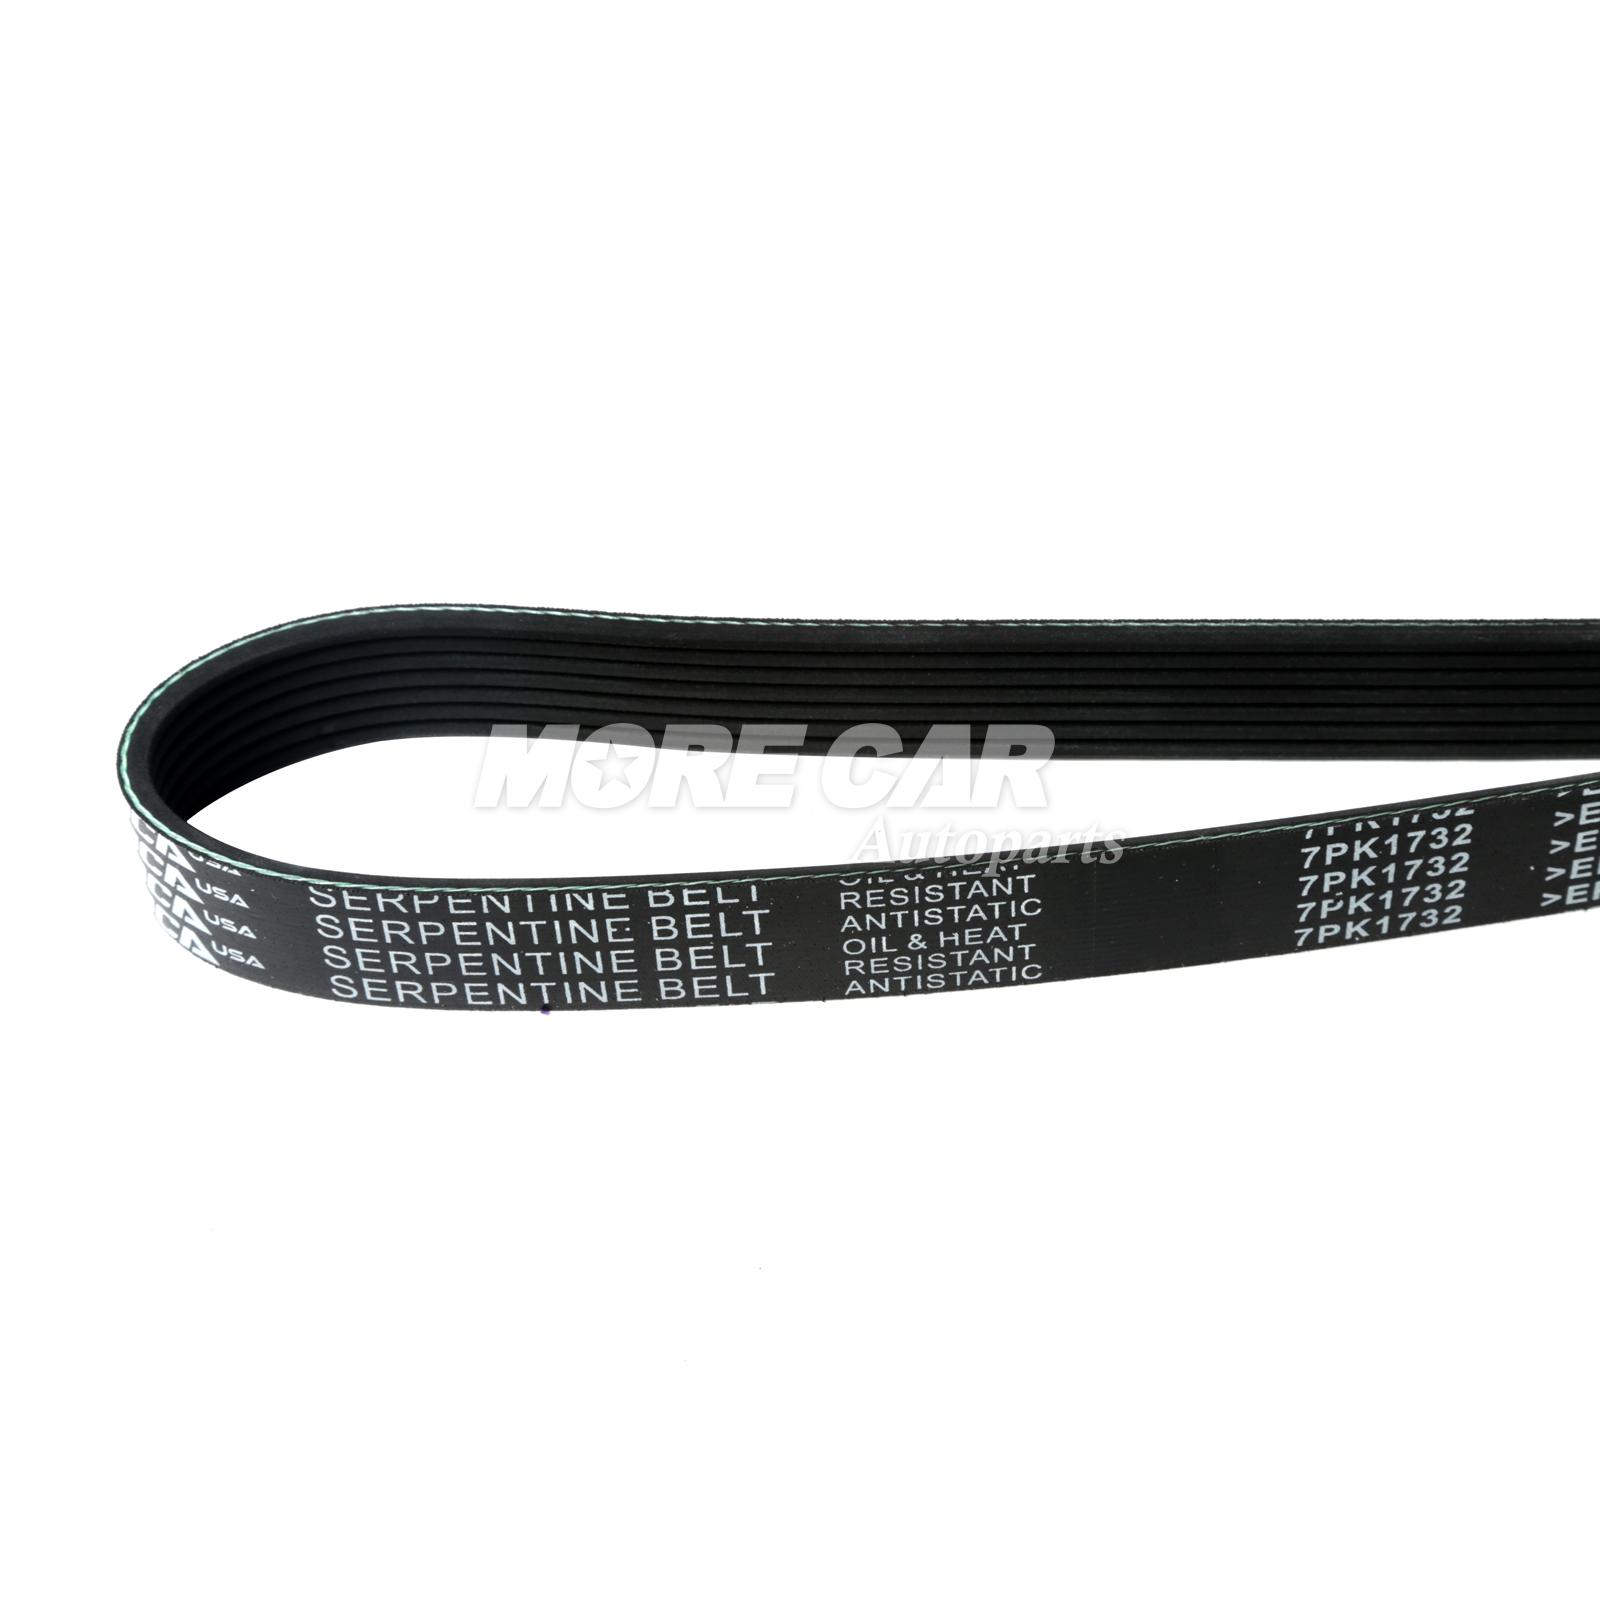 EPDM Serpentine Belt 7PK1732 Fits 02-08 Acura Dodge GAS